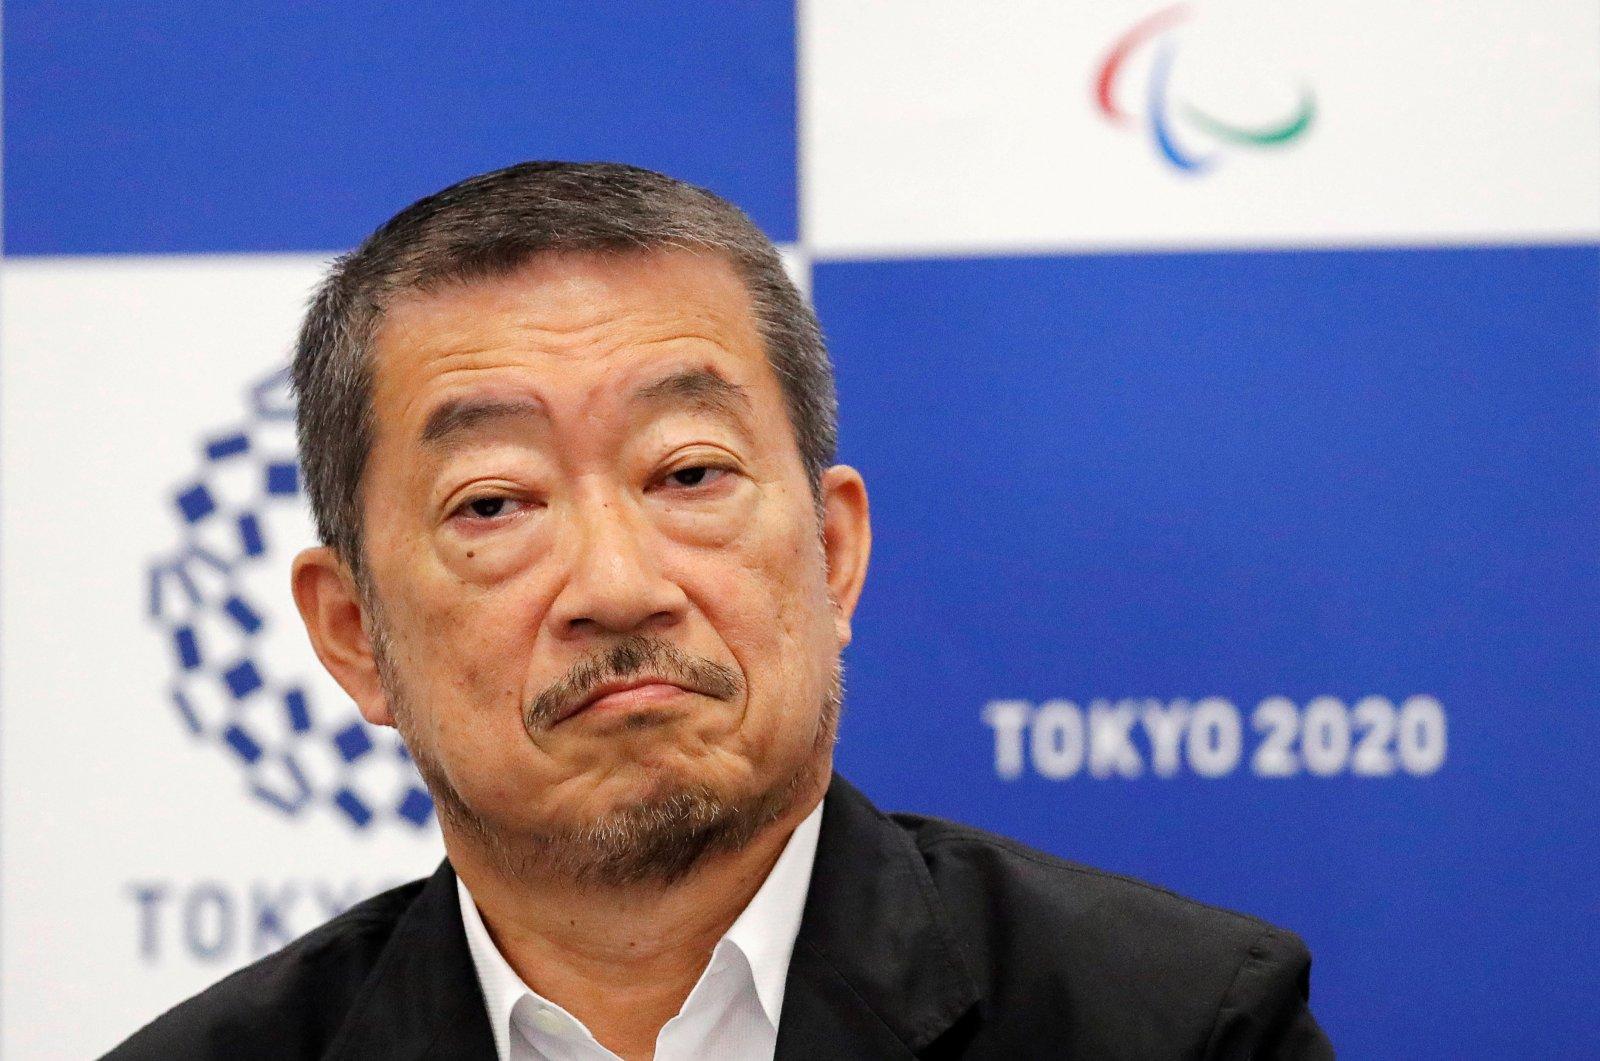 Tokyo 2020 Olympics Executive Creative Director Hiroshi Sasaki attends a news conference in Tokyo, Japan, July 31, 2018. (Reuters Photo)